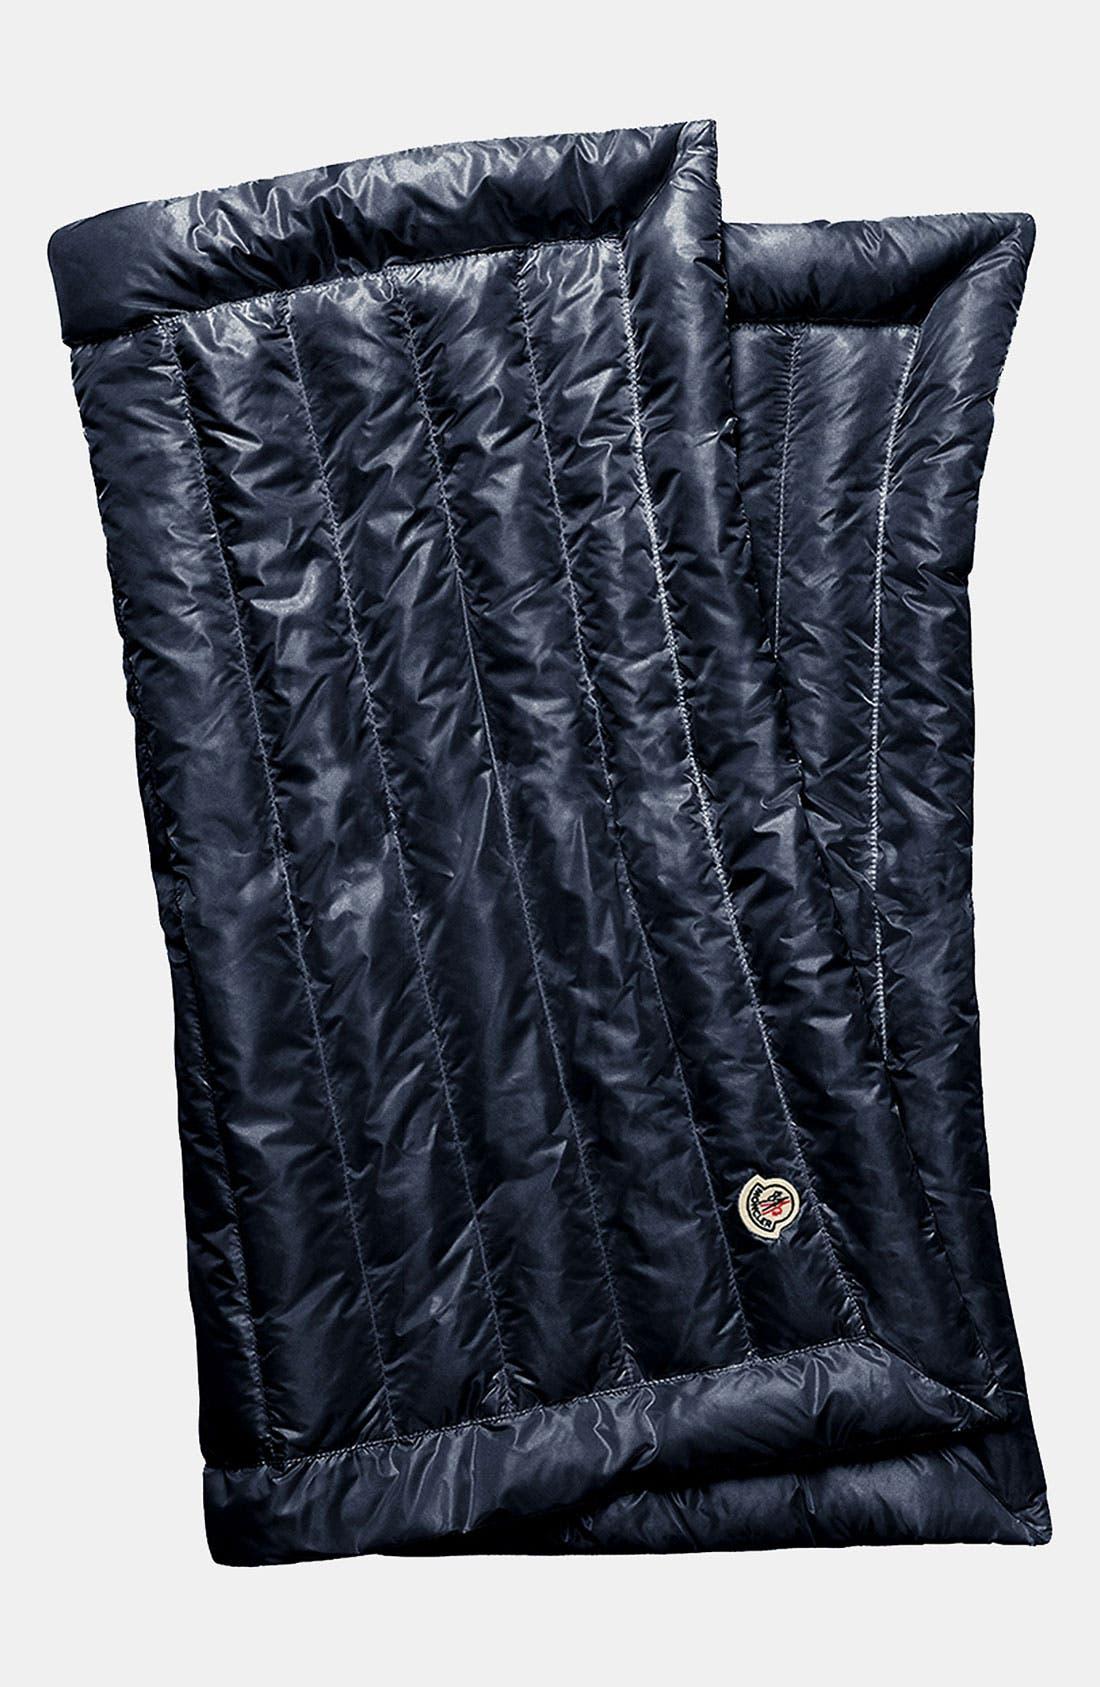 Main Image - Moncler 'Couverture' Blanket